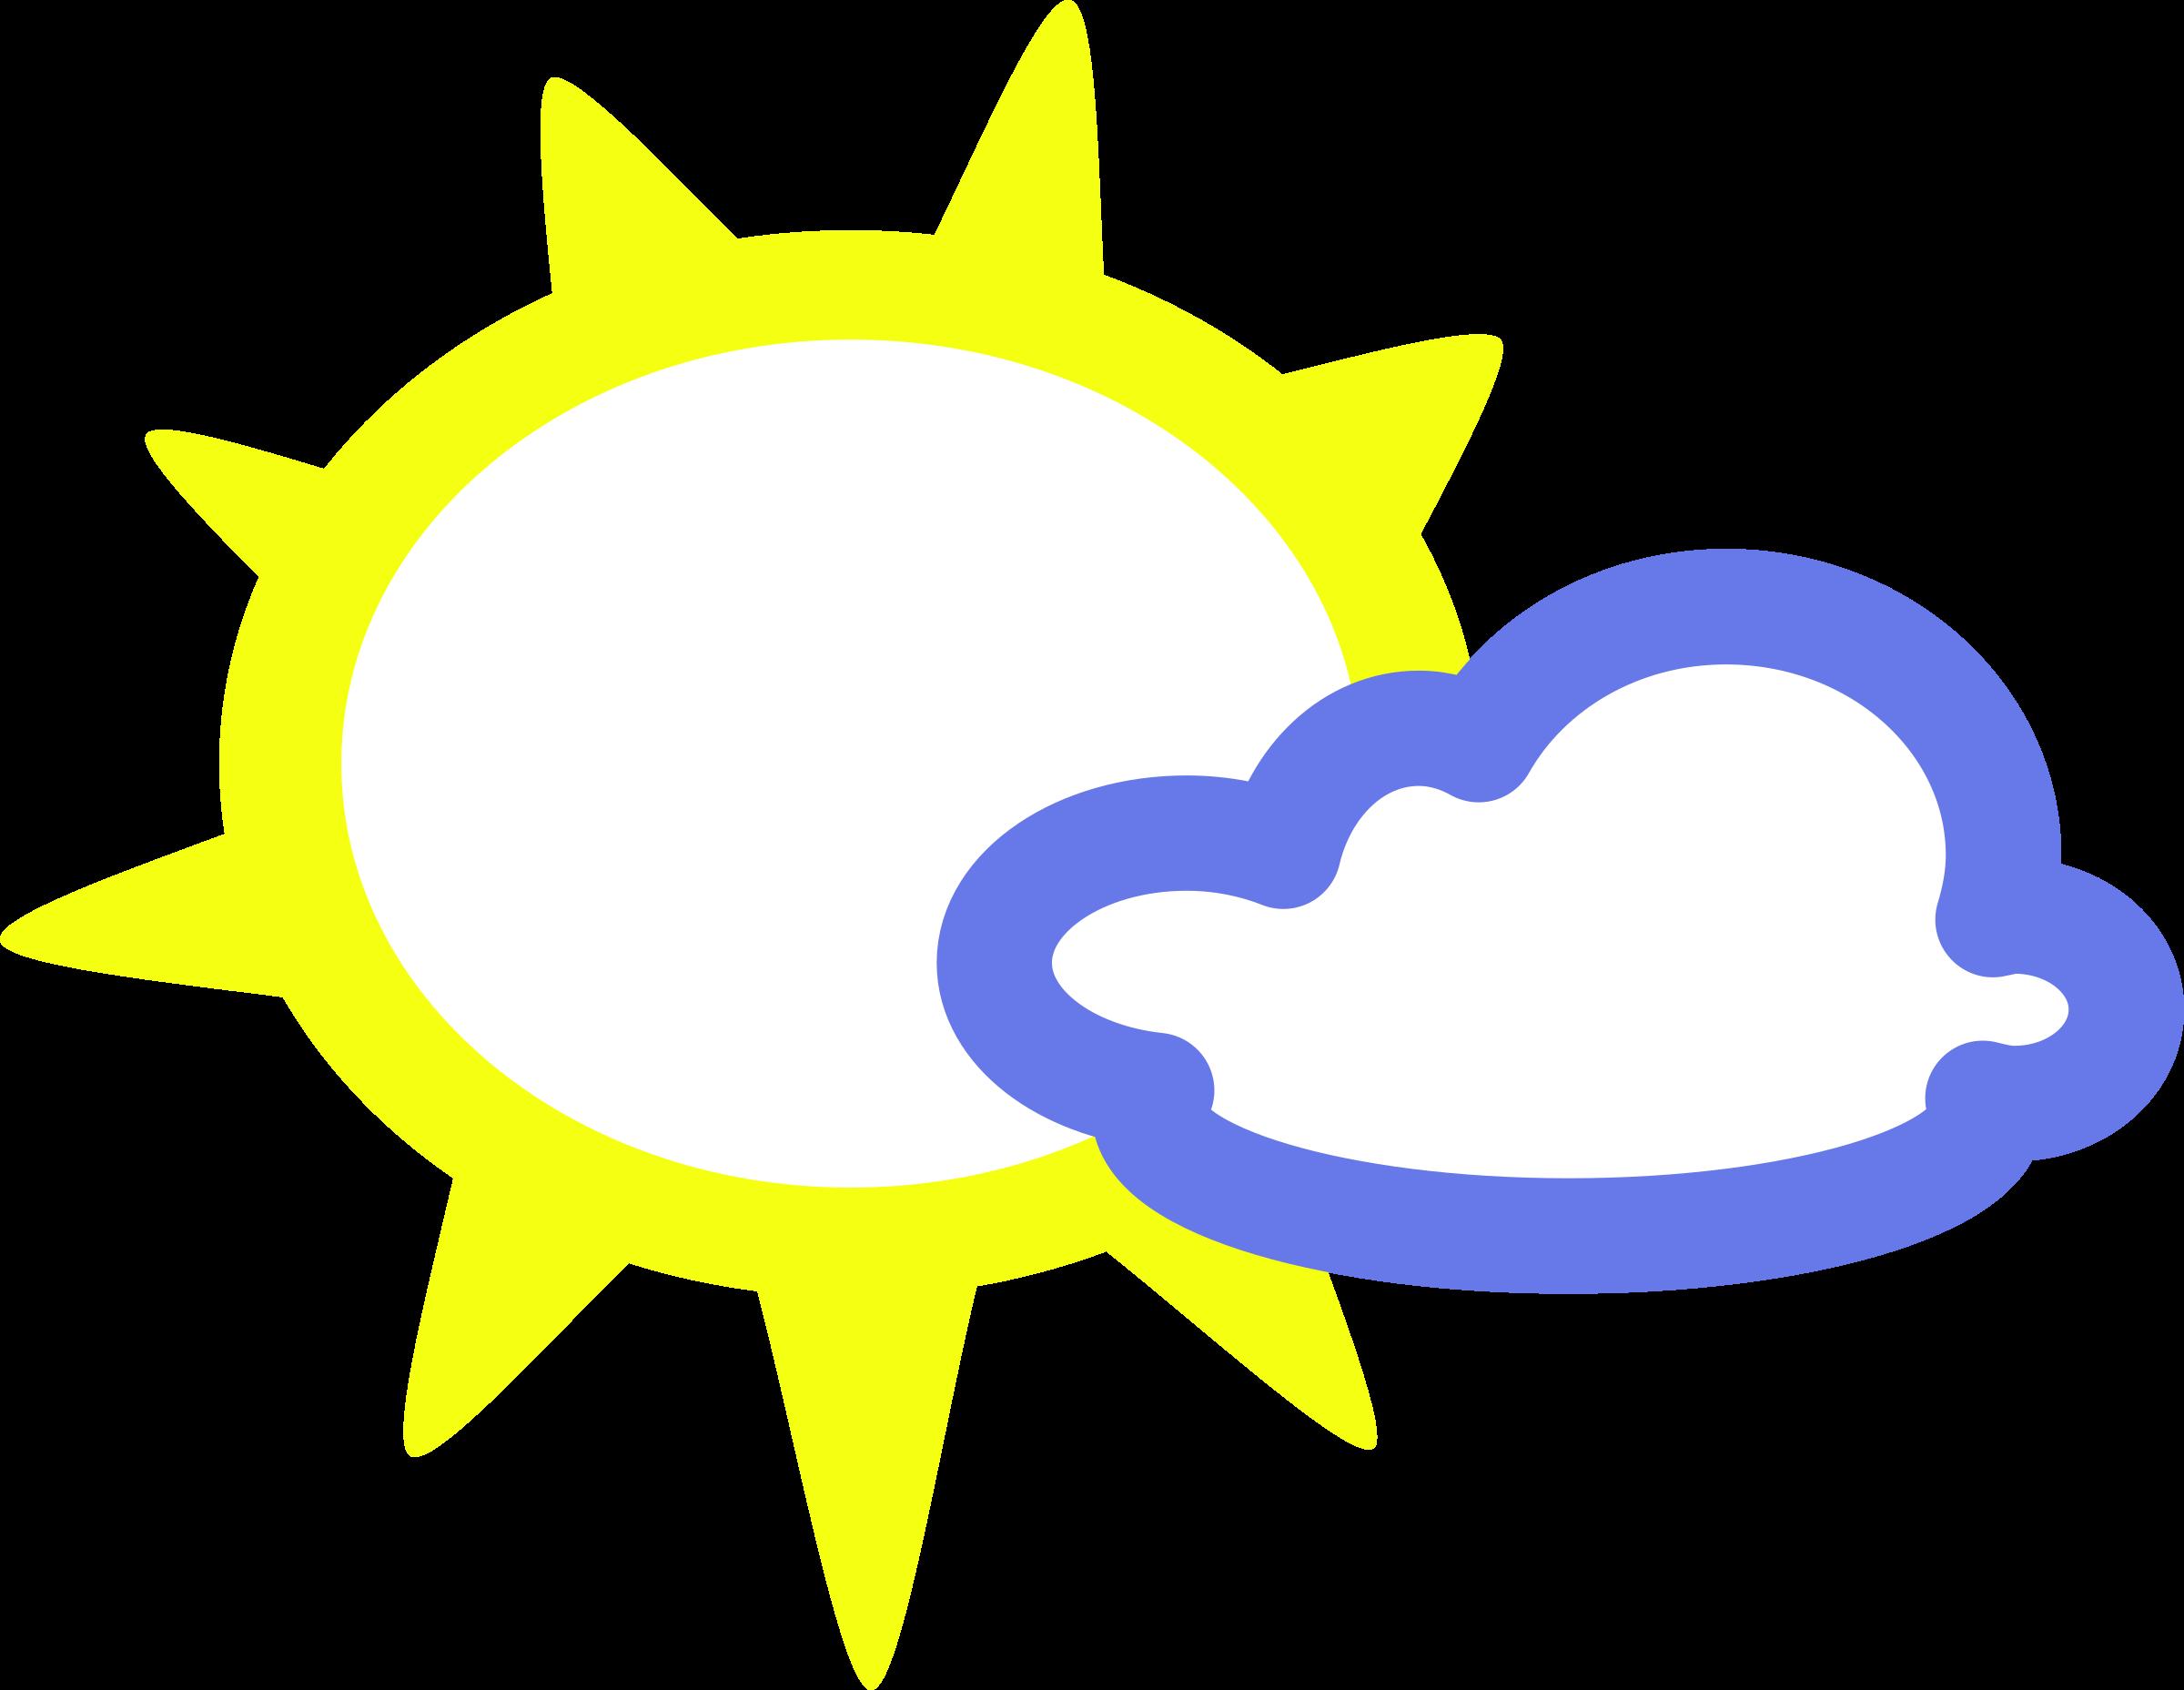 Sunny clipart simple. Weather symbols big image